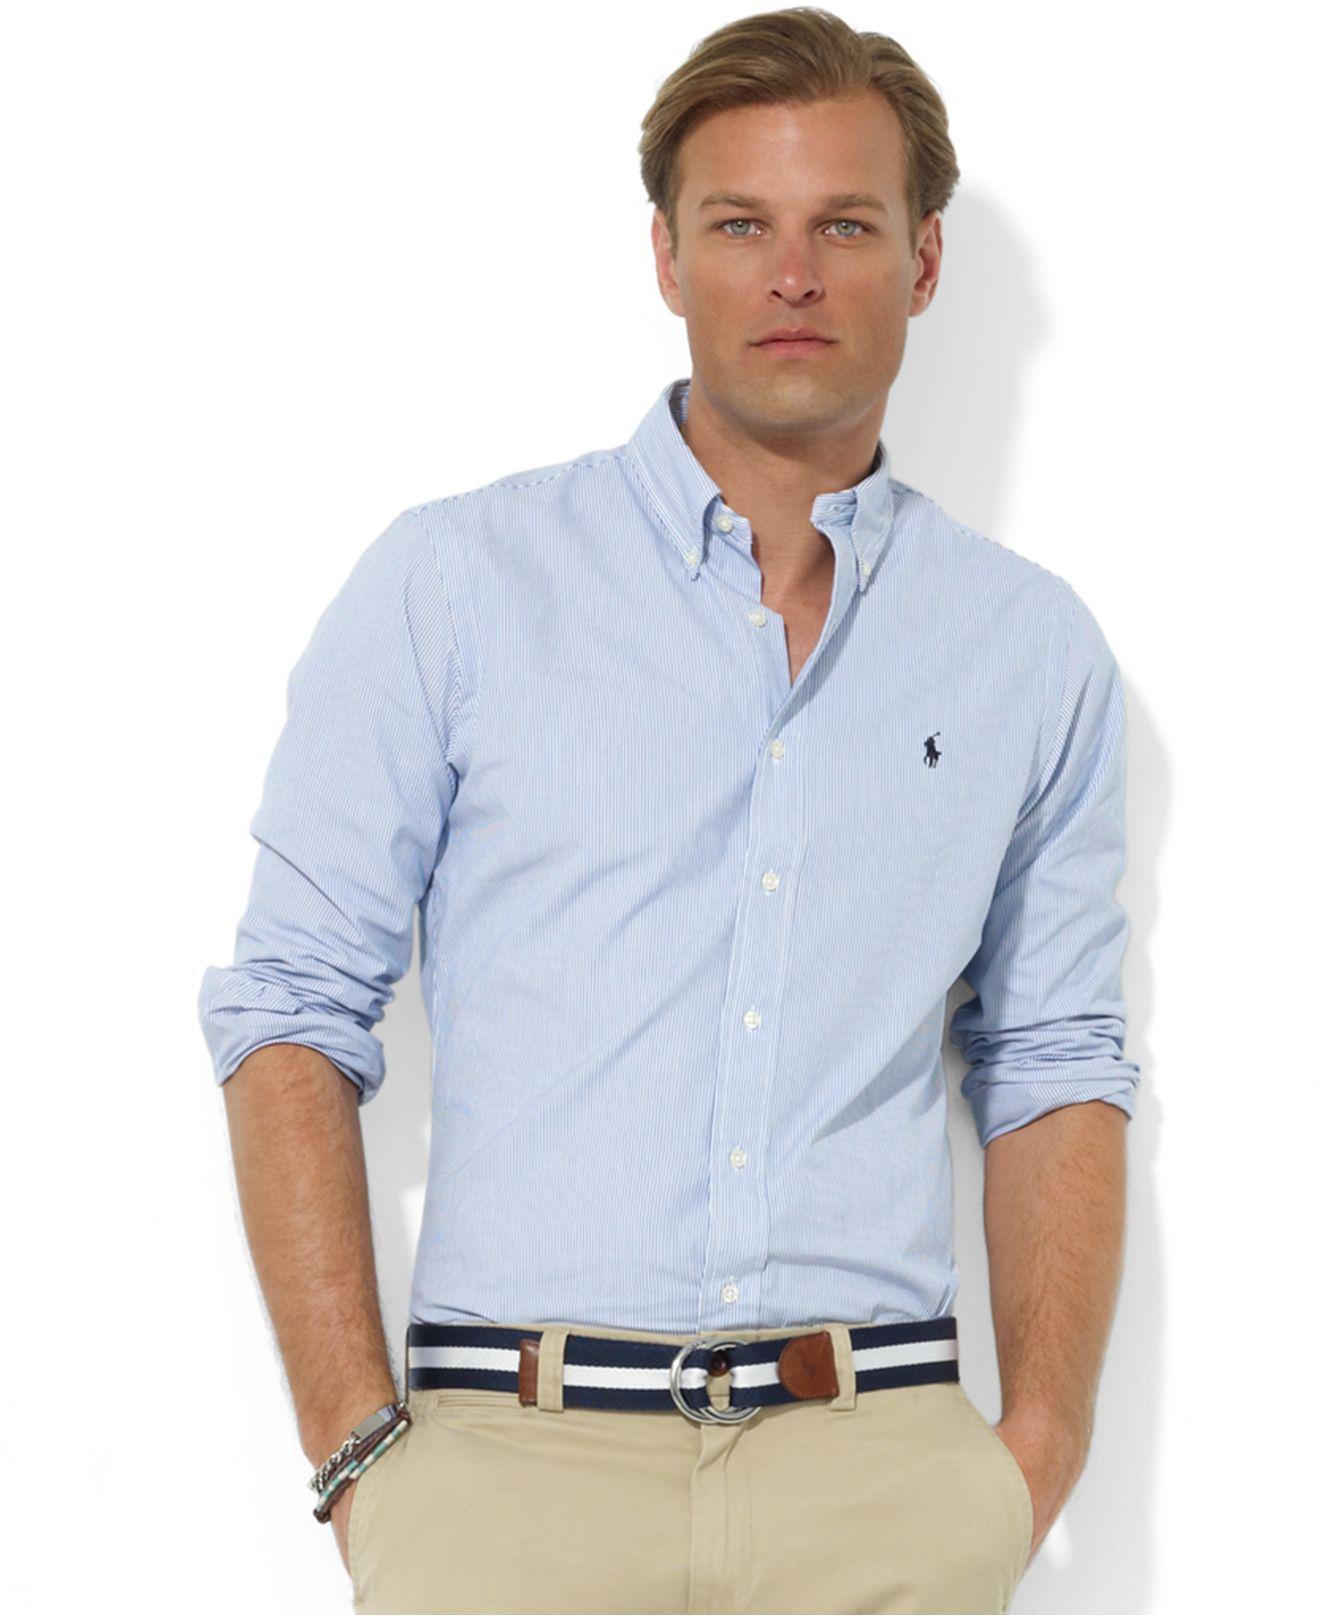 c362c18b9 Polo Ralph Lauren Core Custom Fit Broadcloath Dress Shirt in Blue ...